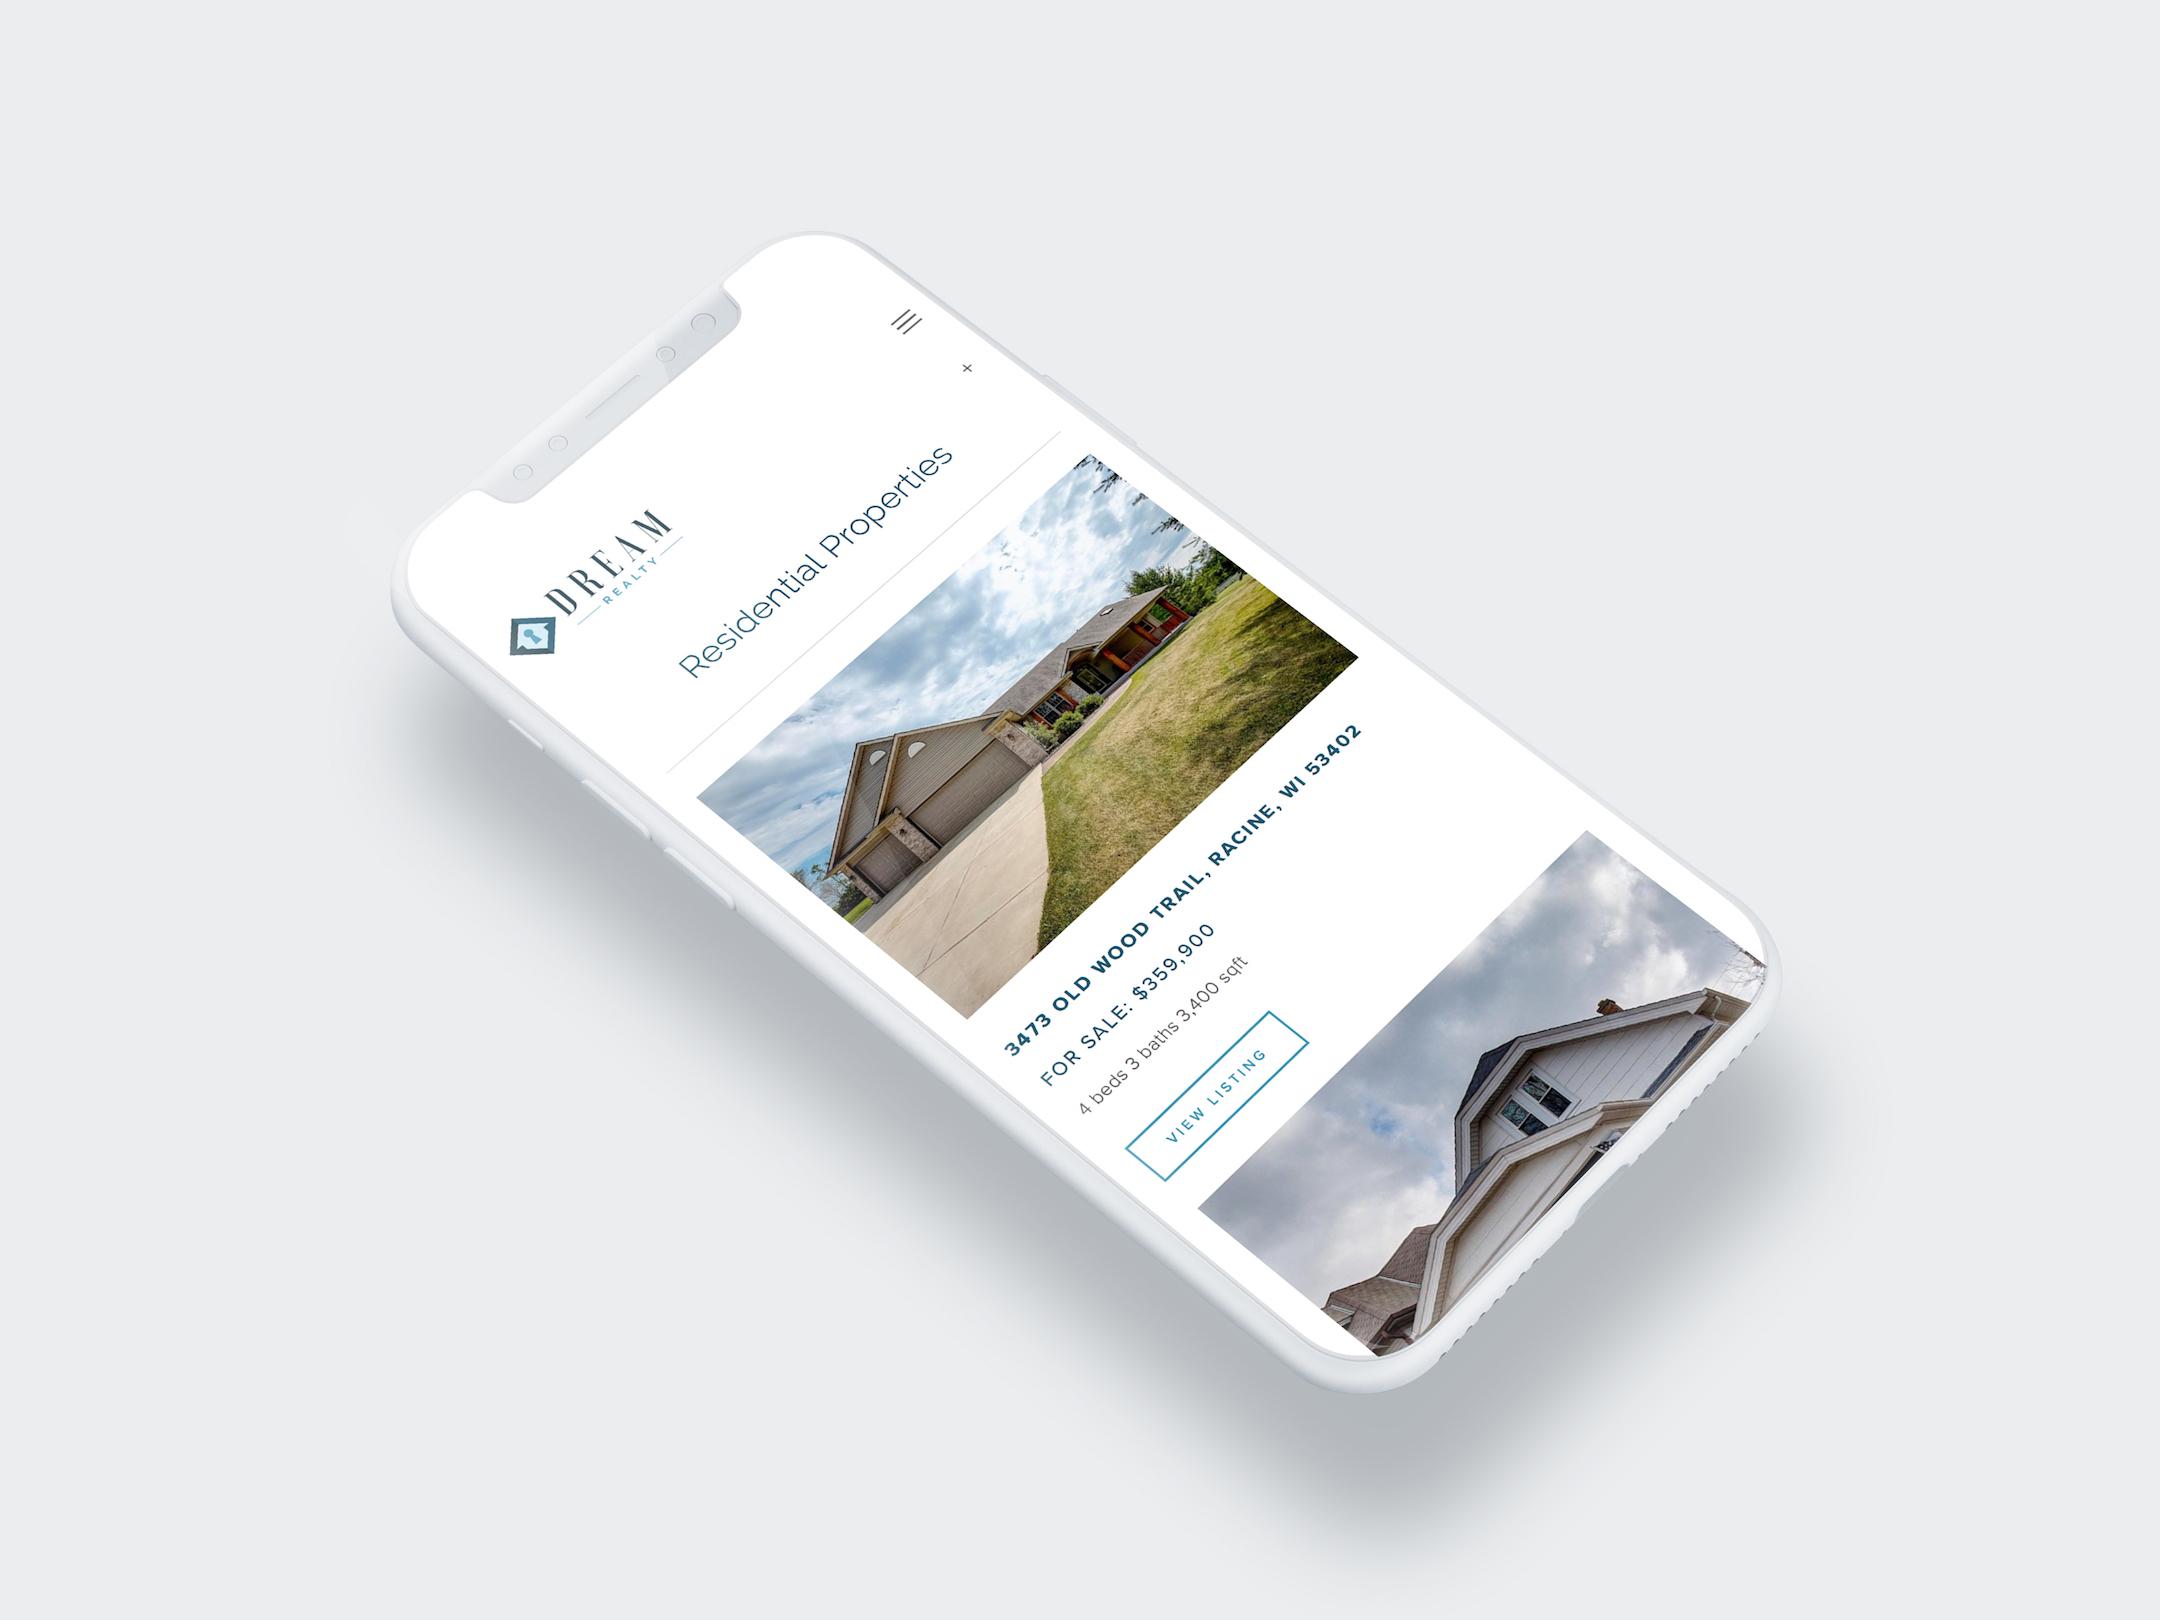 Golden-Antler-Design-Milwaukee-Wisconsin-Branding-Print-Web-Serivces-Website-Development-Dream-Realty